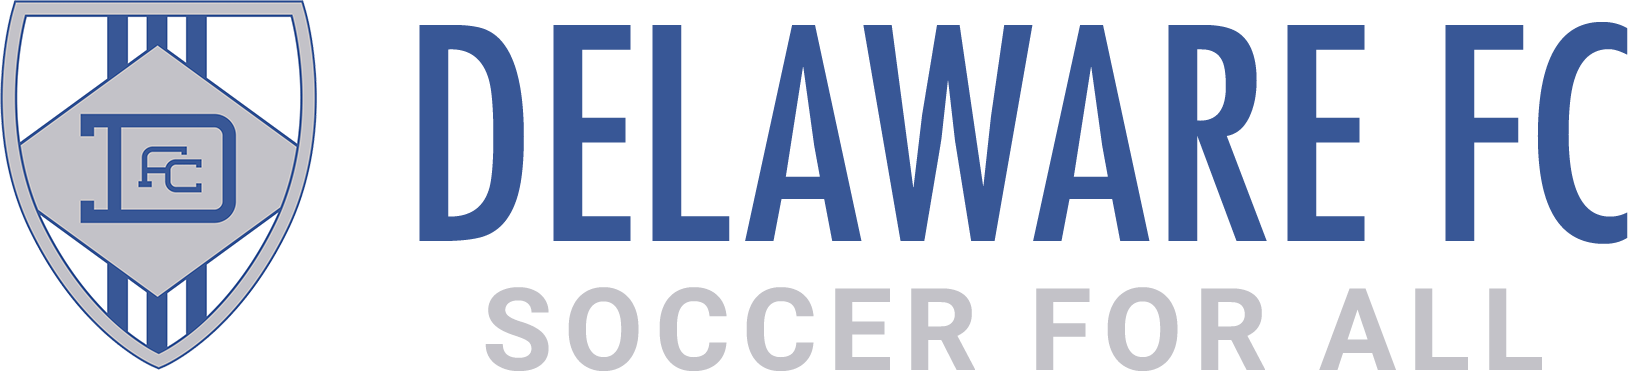 Delaware Football Club